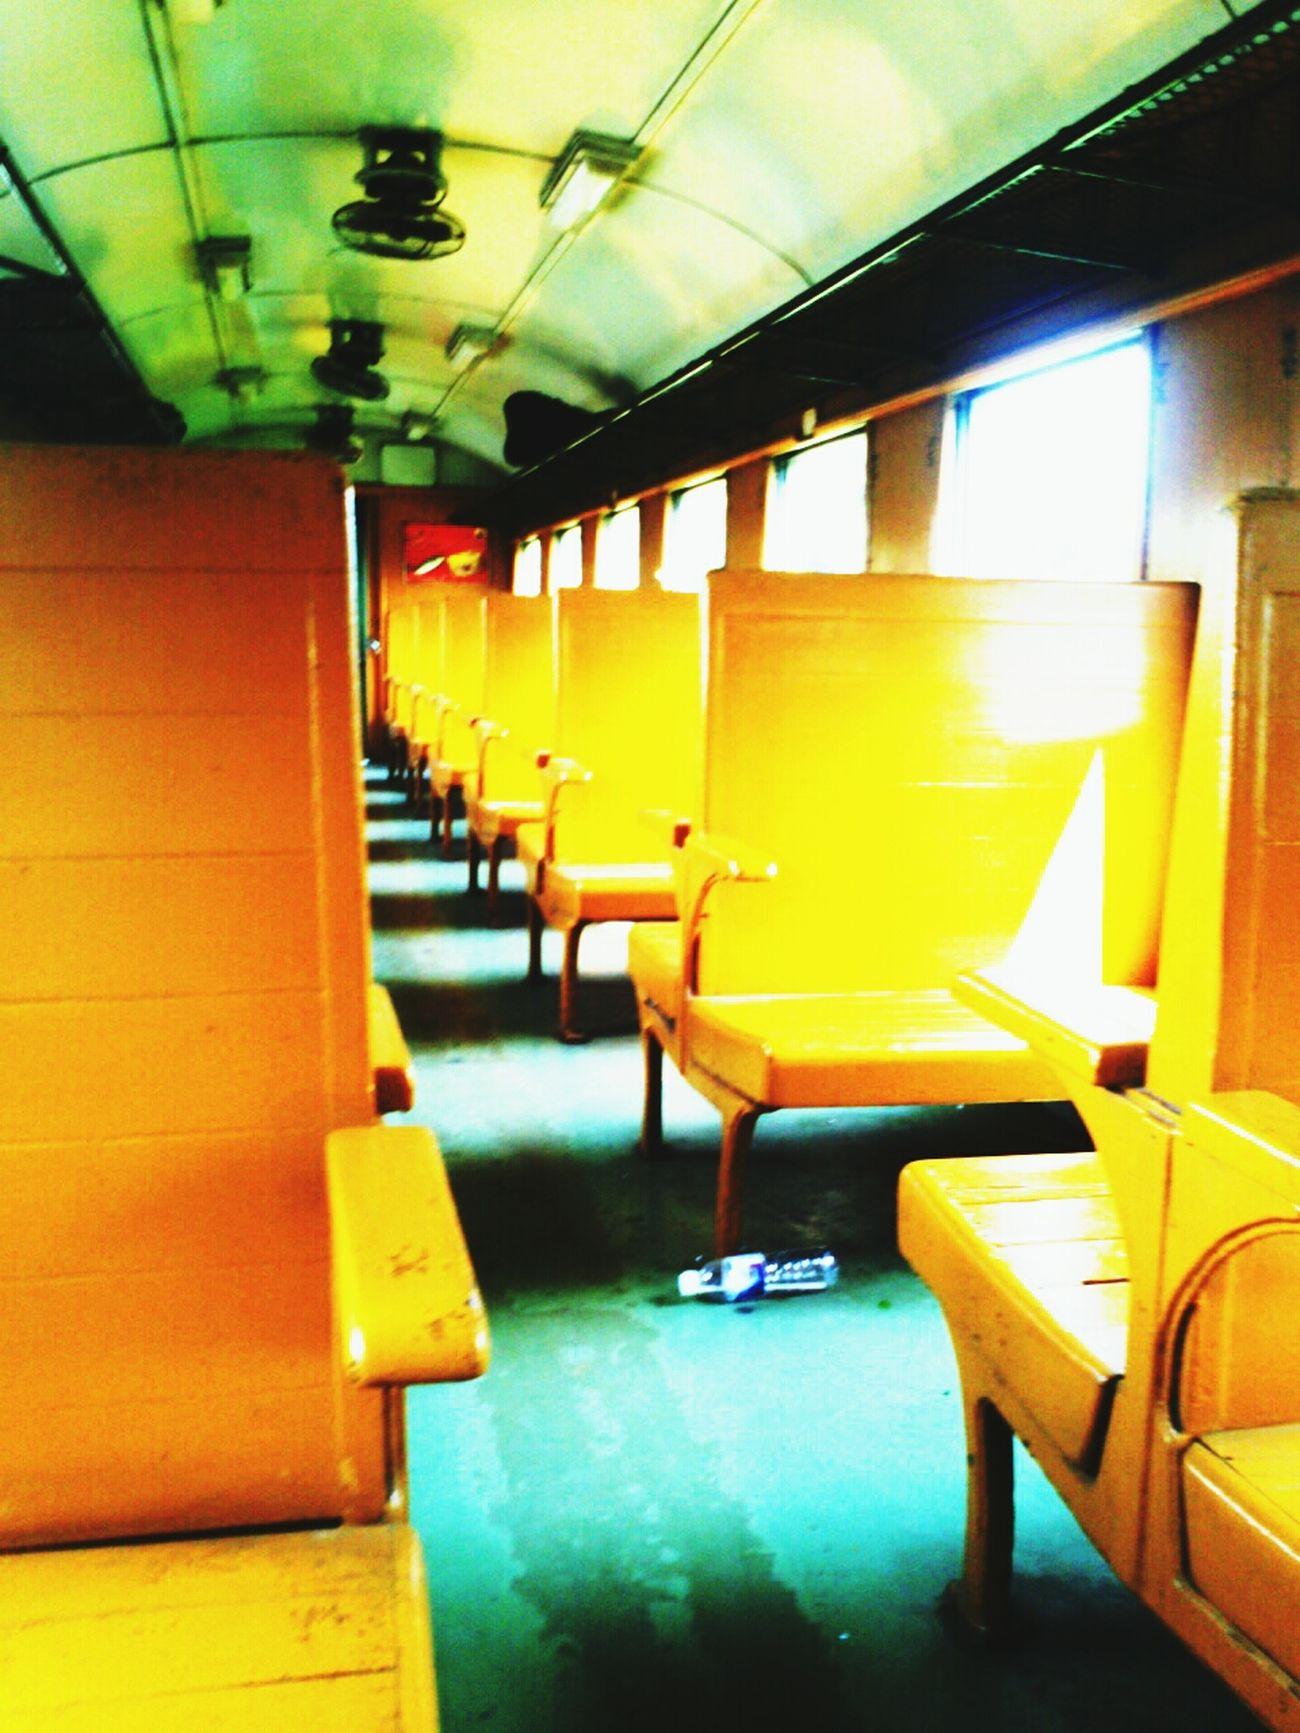 Train Kranchanaburi Thailand travel